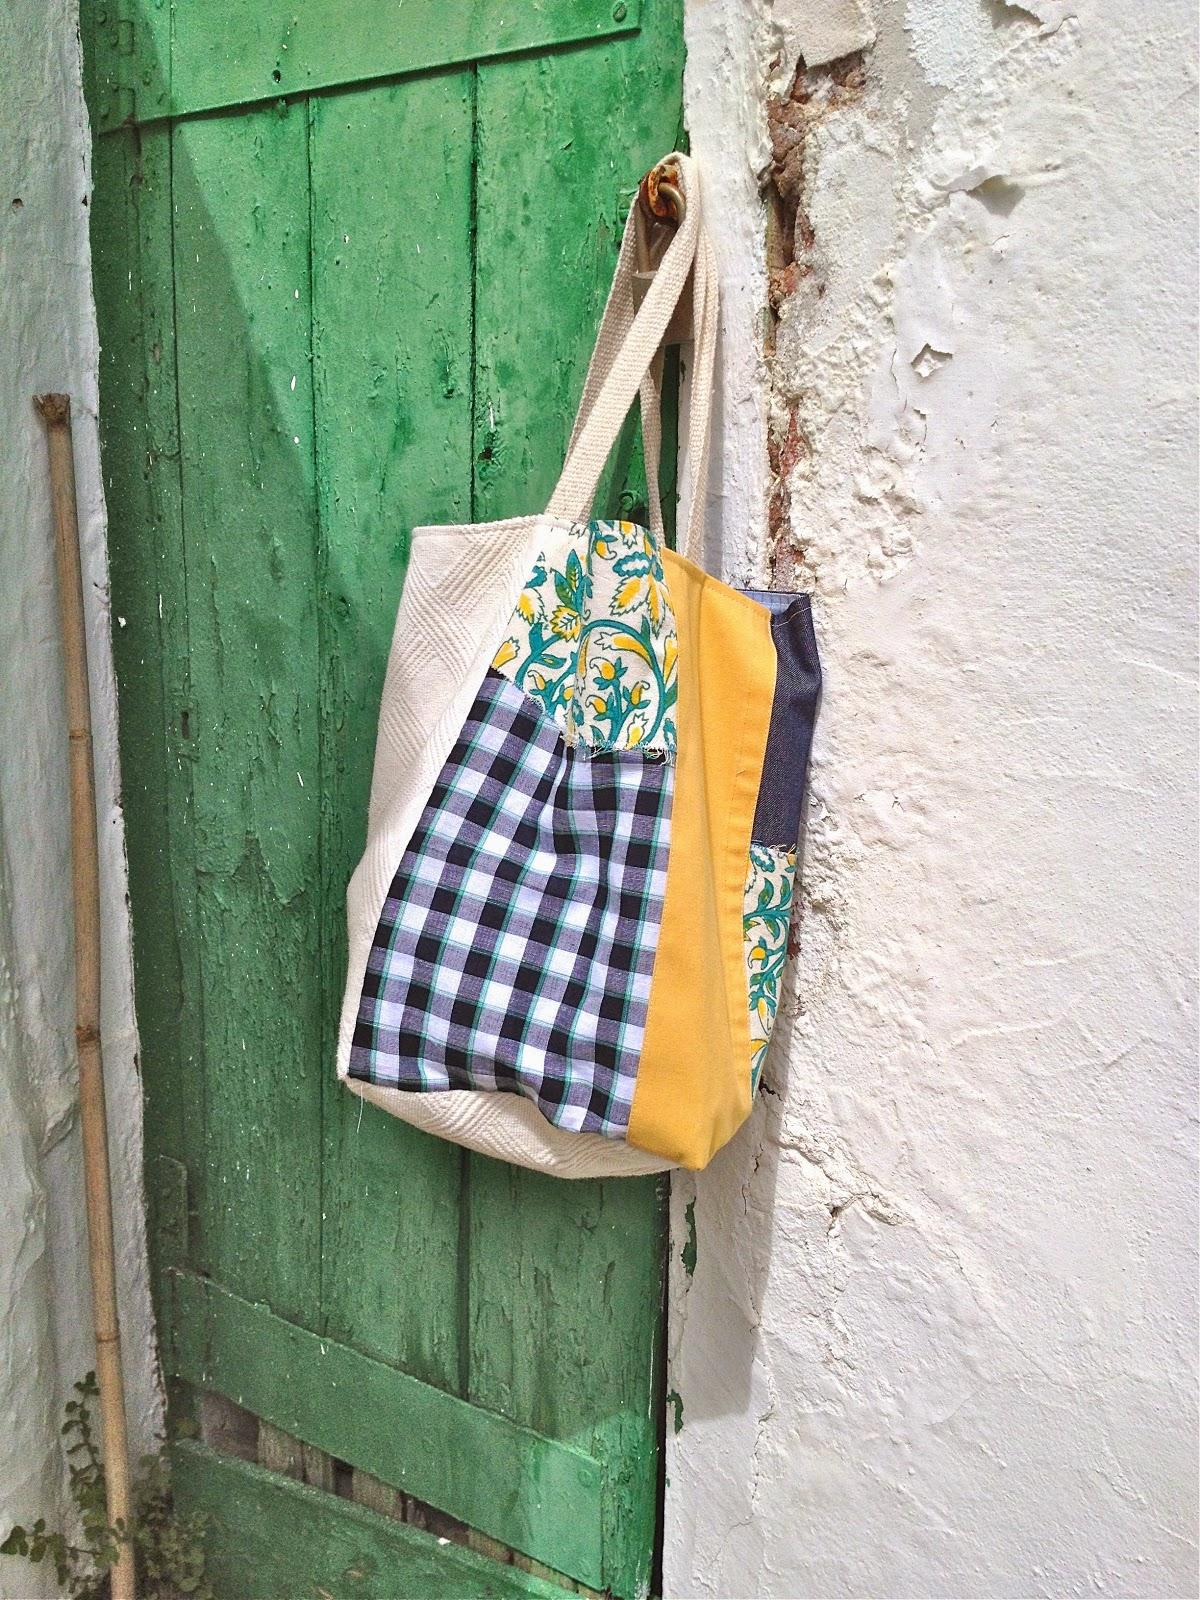 Bolsos de tela hechos a mano barcelona cosecosebcn - Cuadros con tela de saco ...